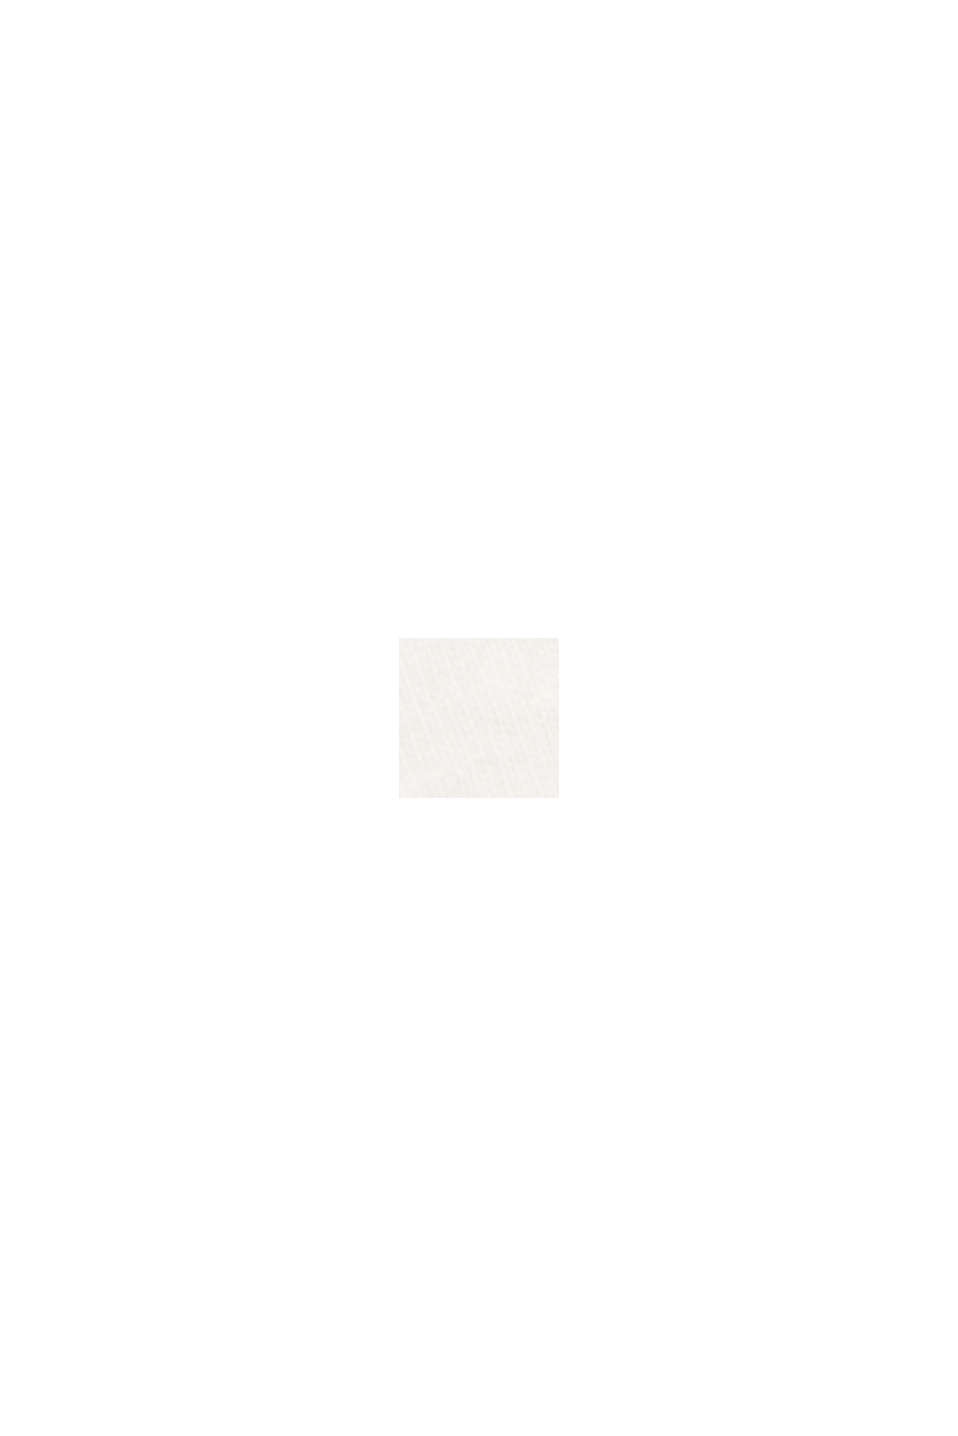 Jersey T-shirt van biologisch katoen/linnen, OFF WHITE, swatch